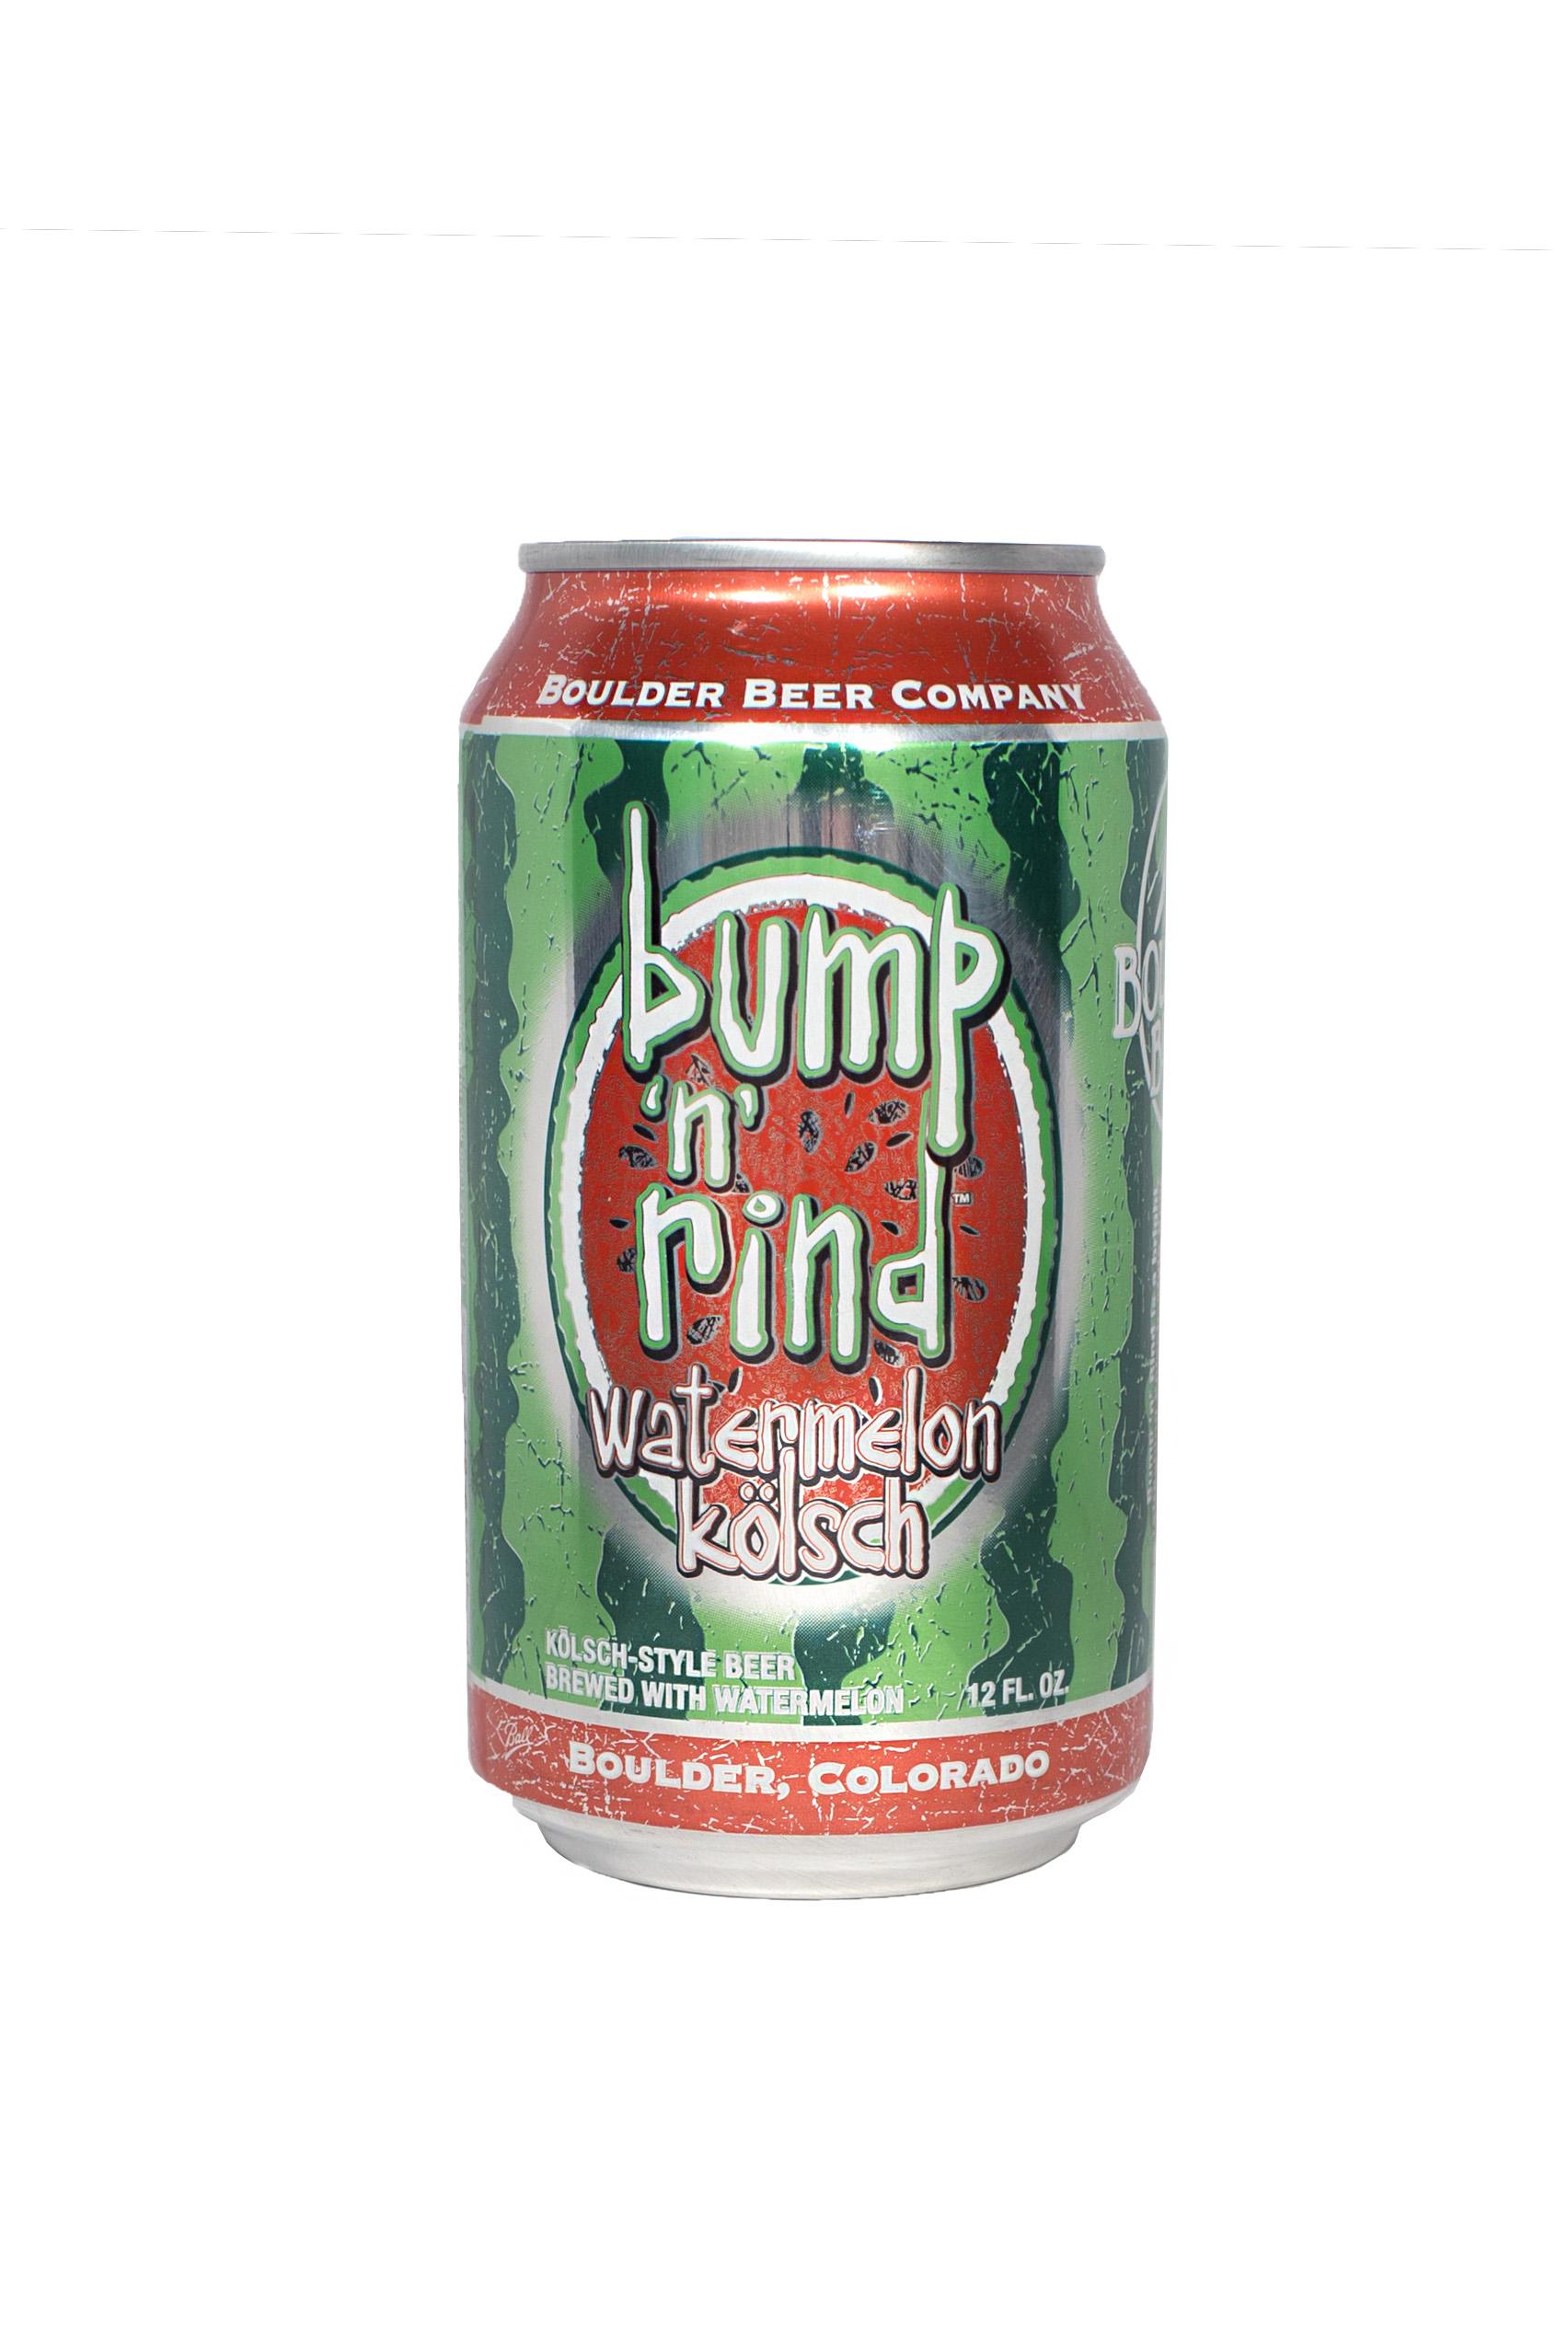 Bump single can.jpg